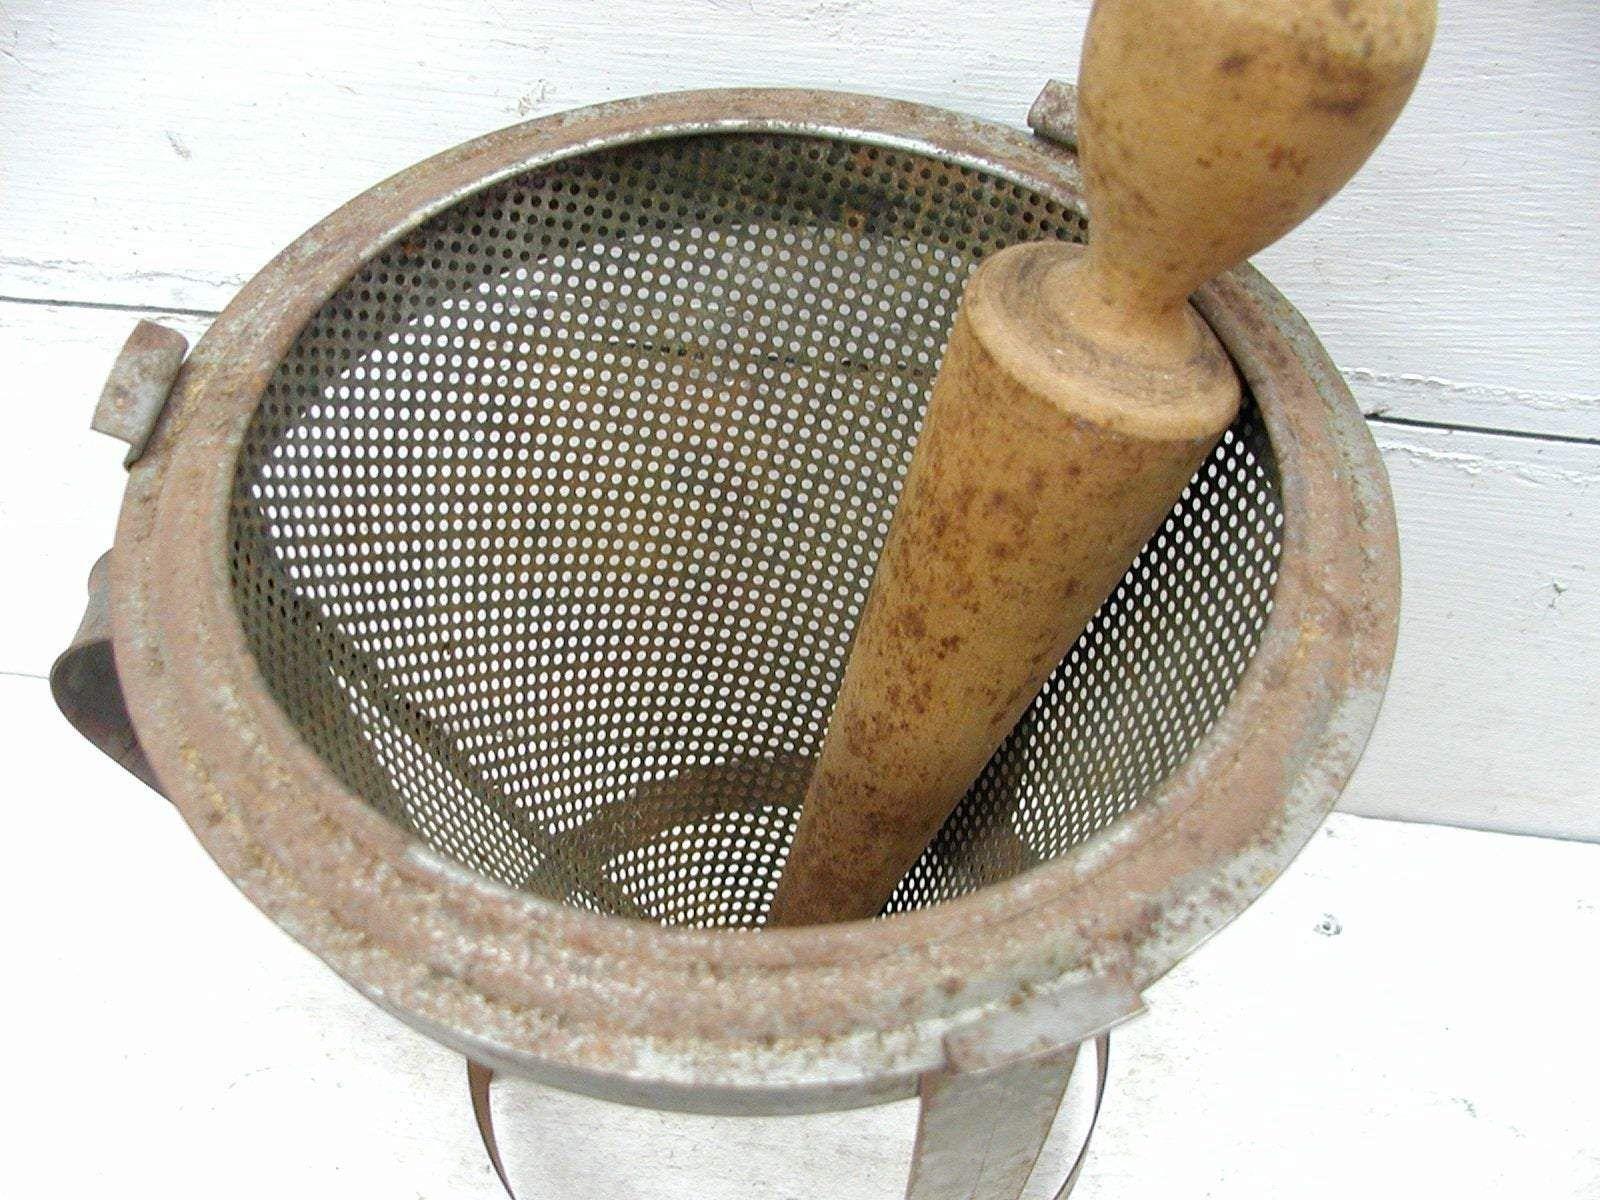 Vintage Metal Sifter Sieve Ricer - Counter Top Tin Kitchen Gadget